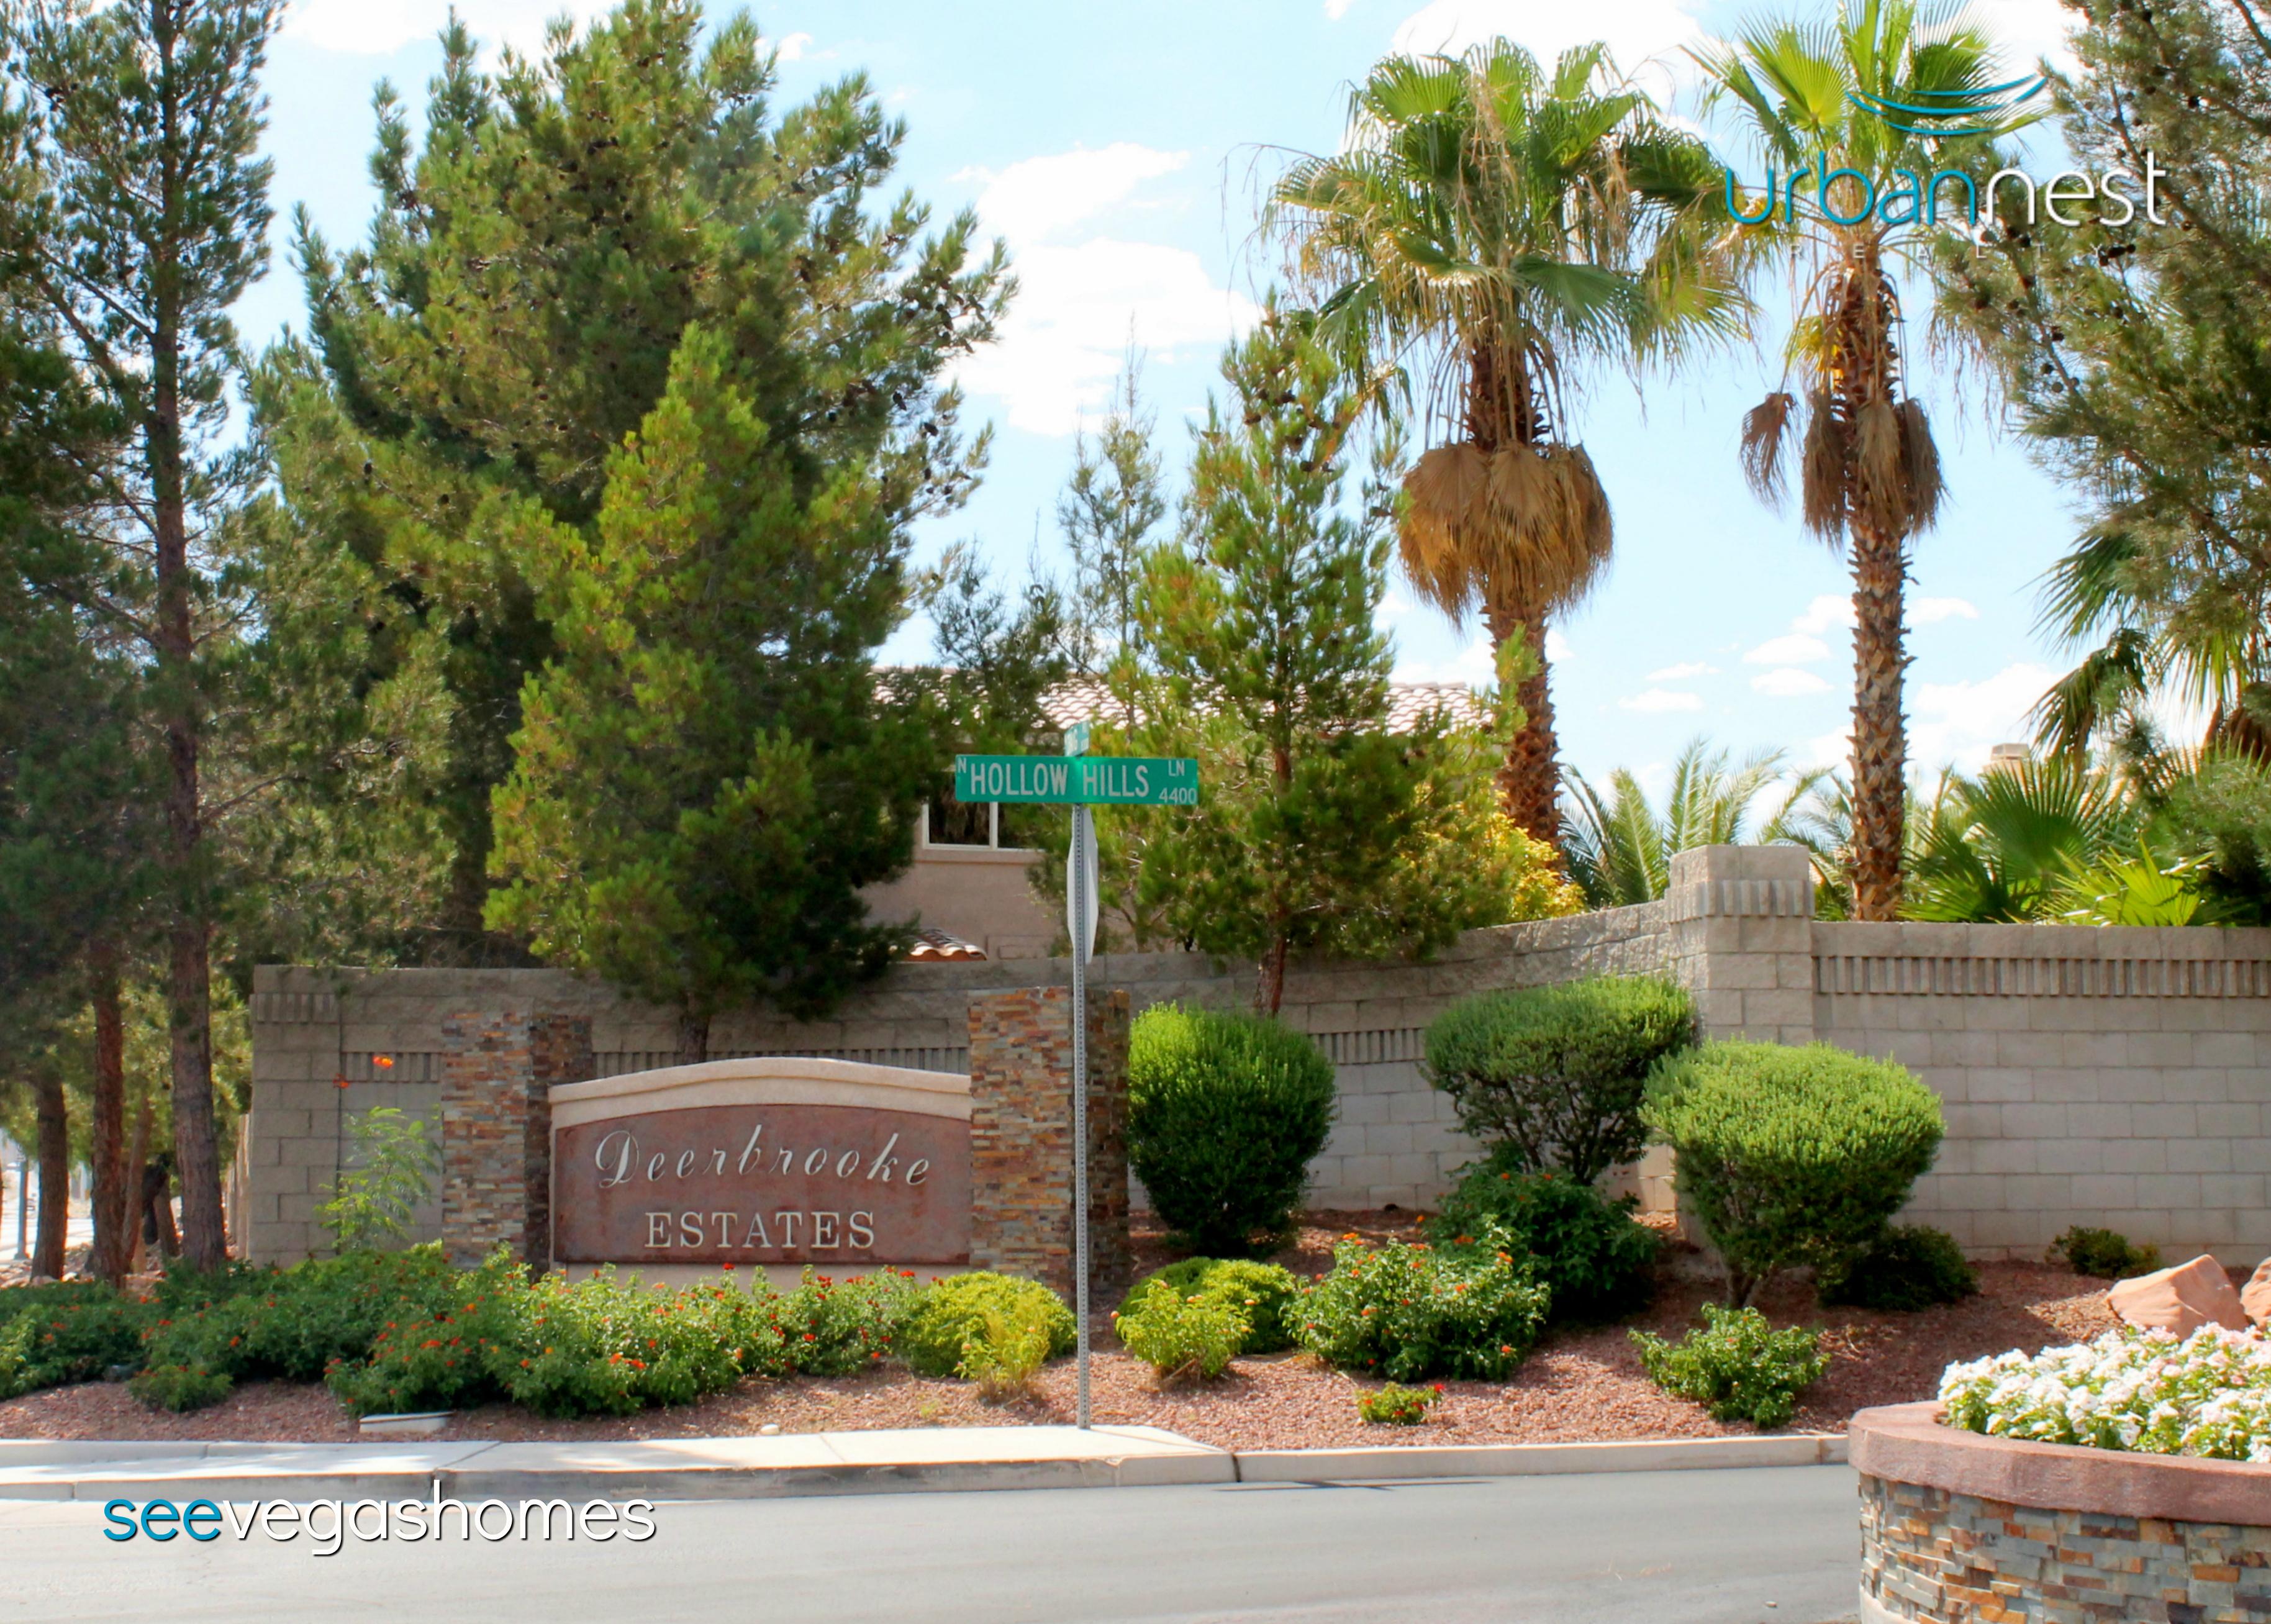 Deerbrooke Estates Monterey Est Subdivision Las Vegas NV 89129 SeeVegasHomes